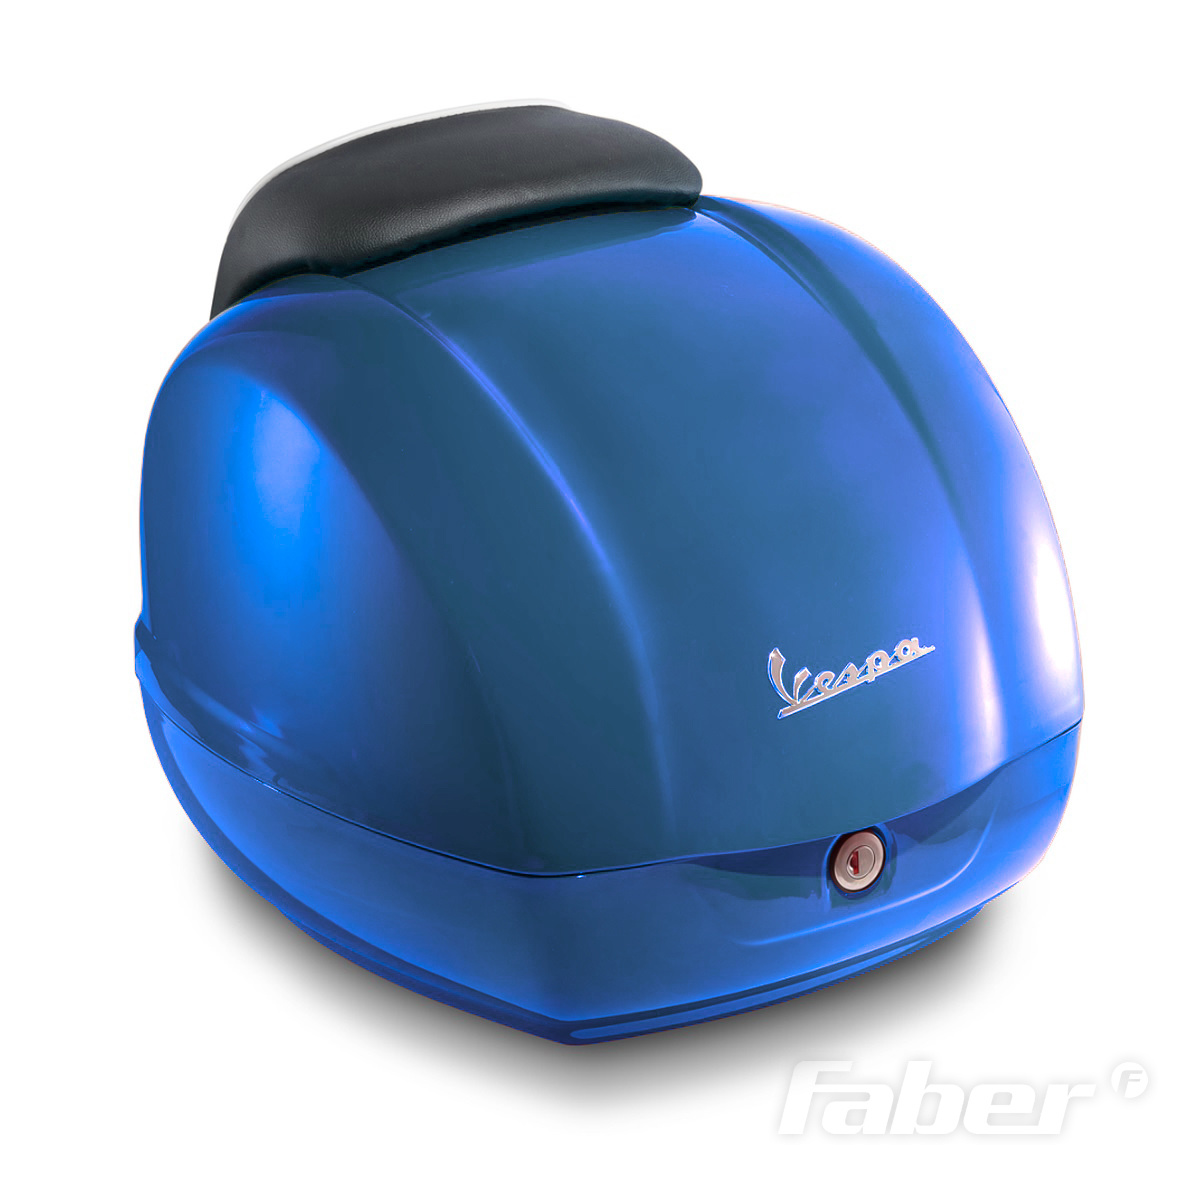 Kufr GTS modrý matný